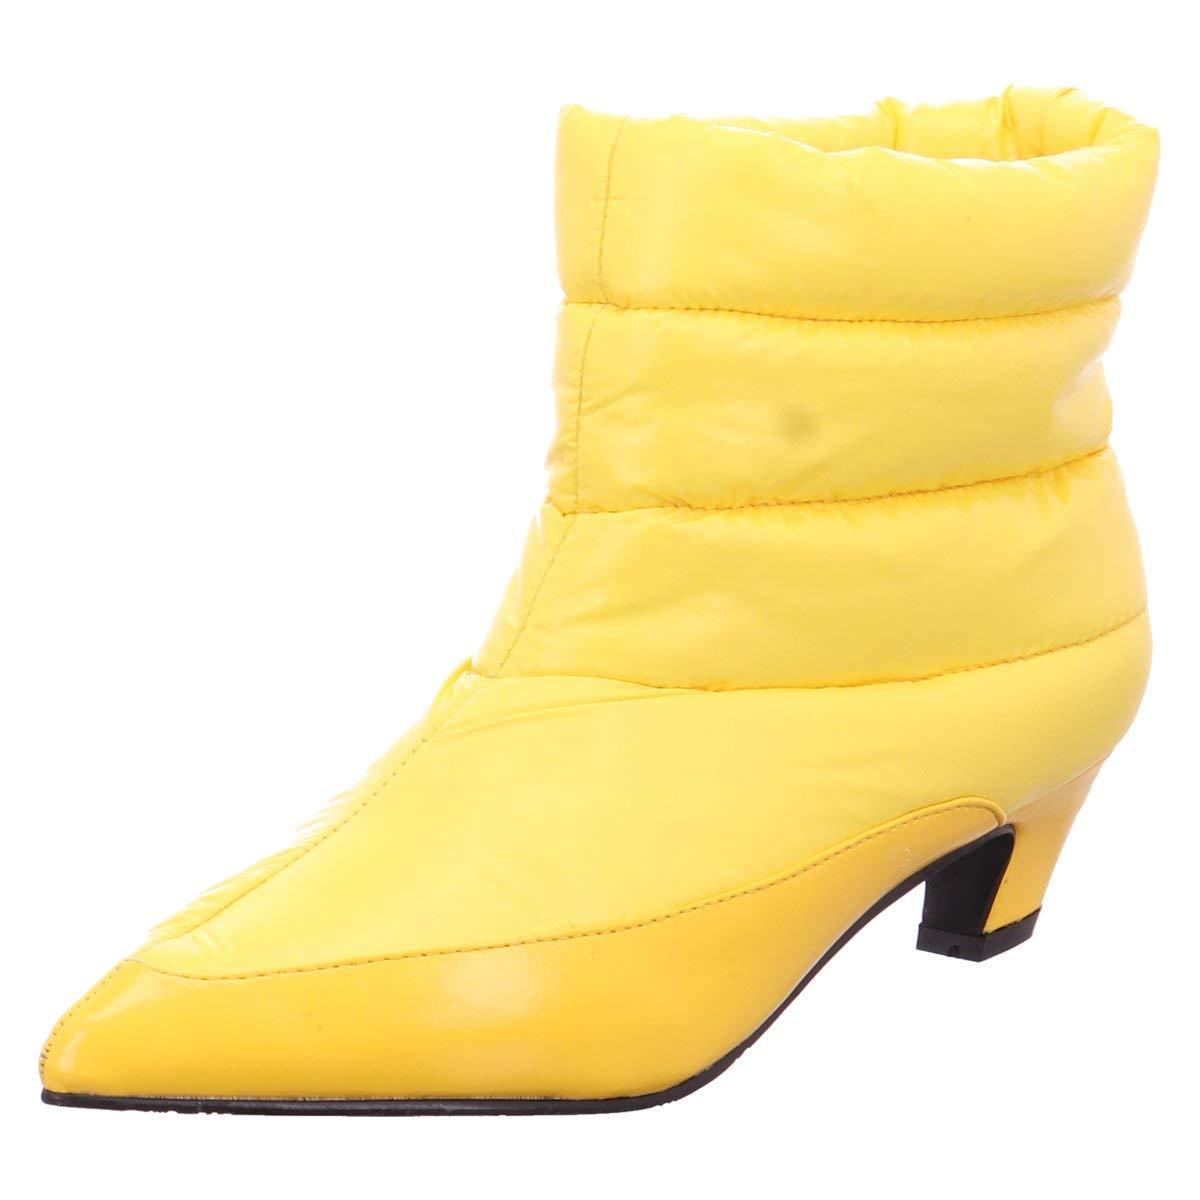 XYXYX Damen Stiefeletten 6508701 6508701 6508701 gelb 554285 c5cf1f